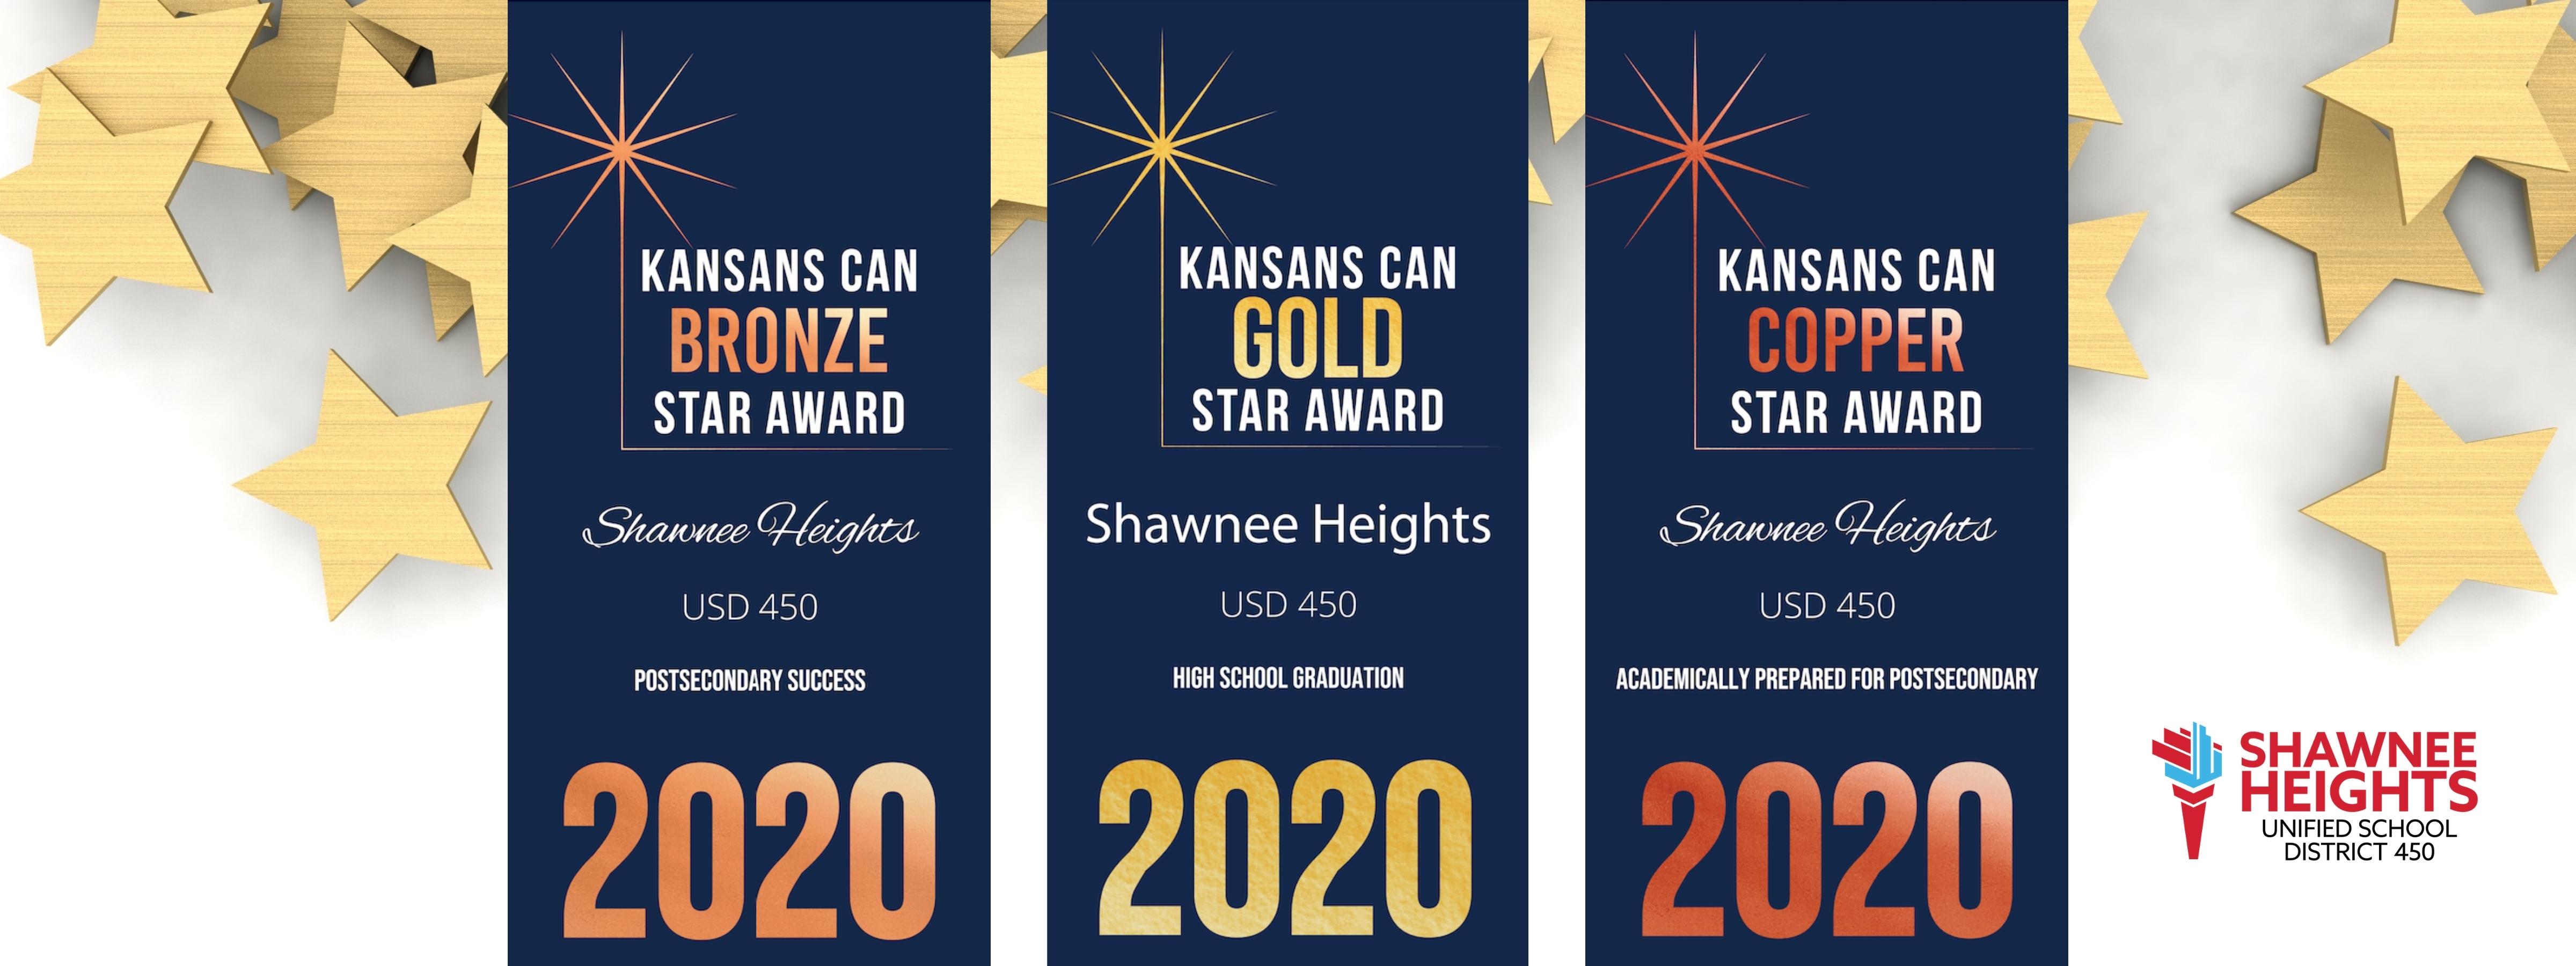 Kansas Can Star Recognition Awards